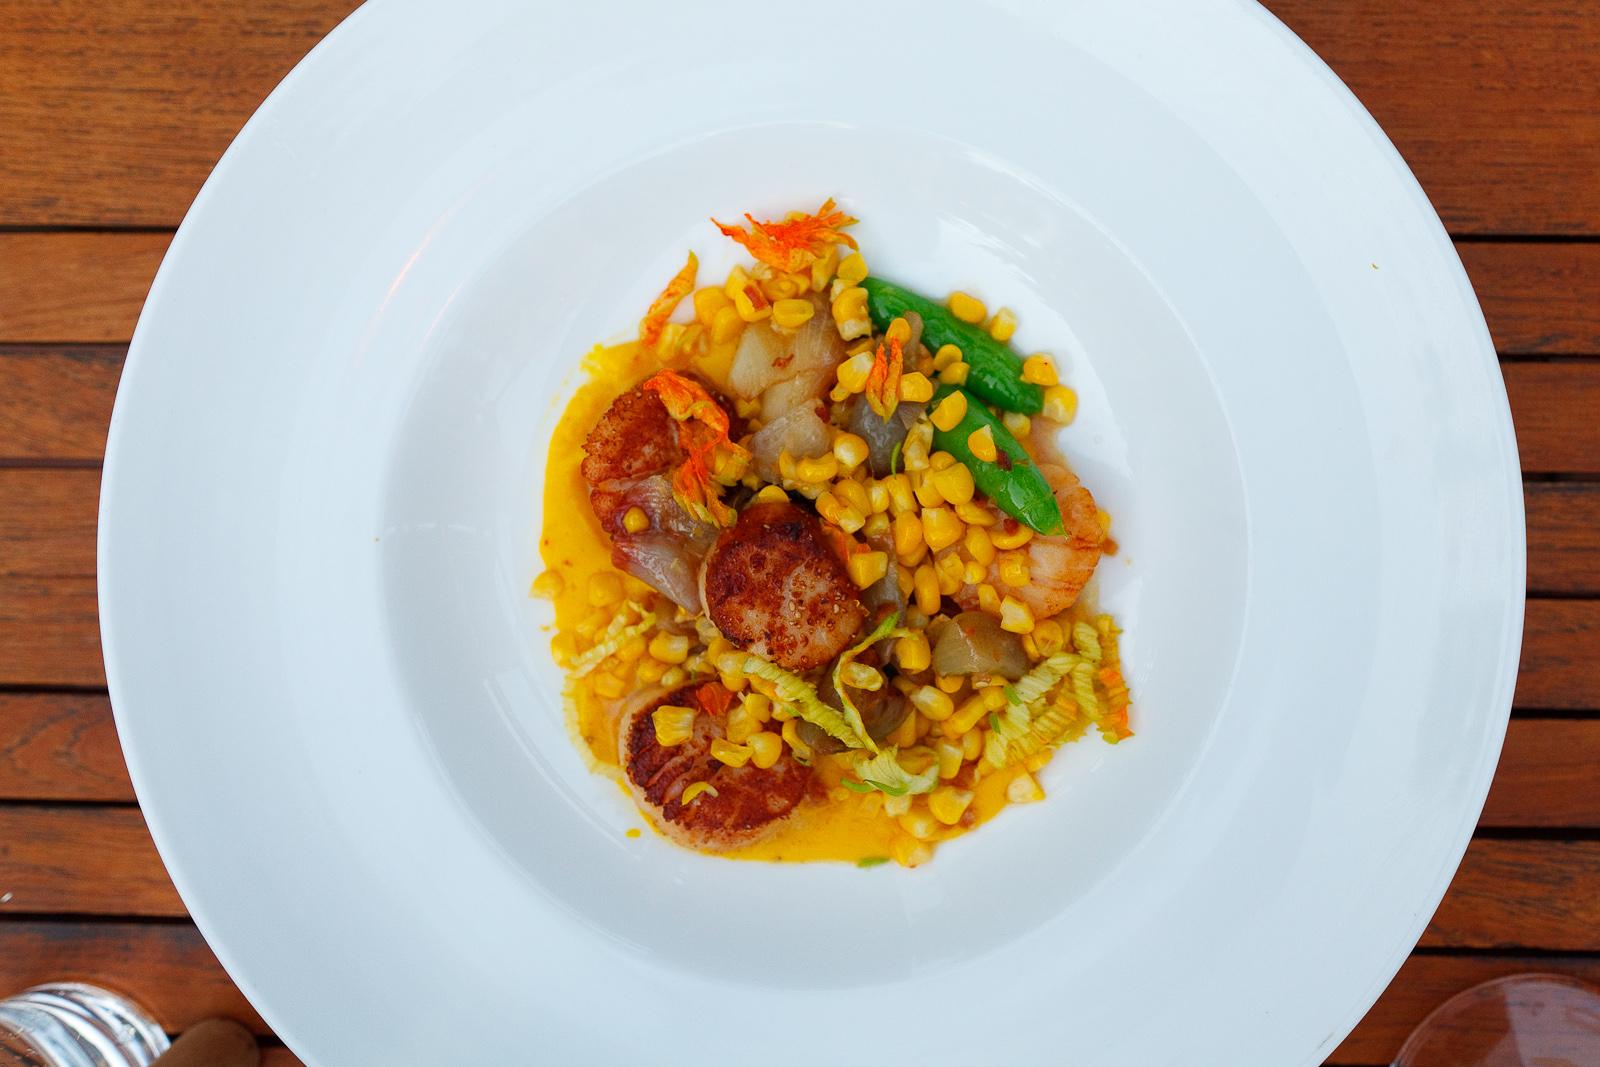 Pan seared scallops, saffron-corn puree, snap peas, corn shallots, squash blossom, bacon vinaigrette ($26)